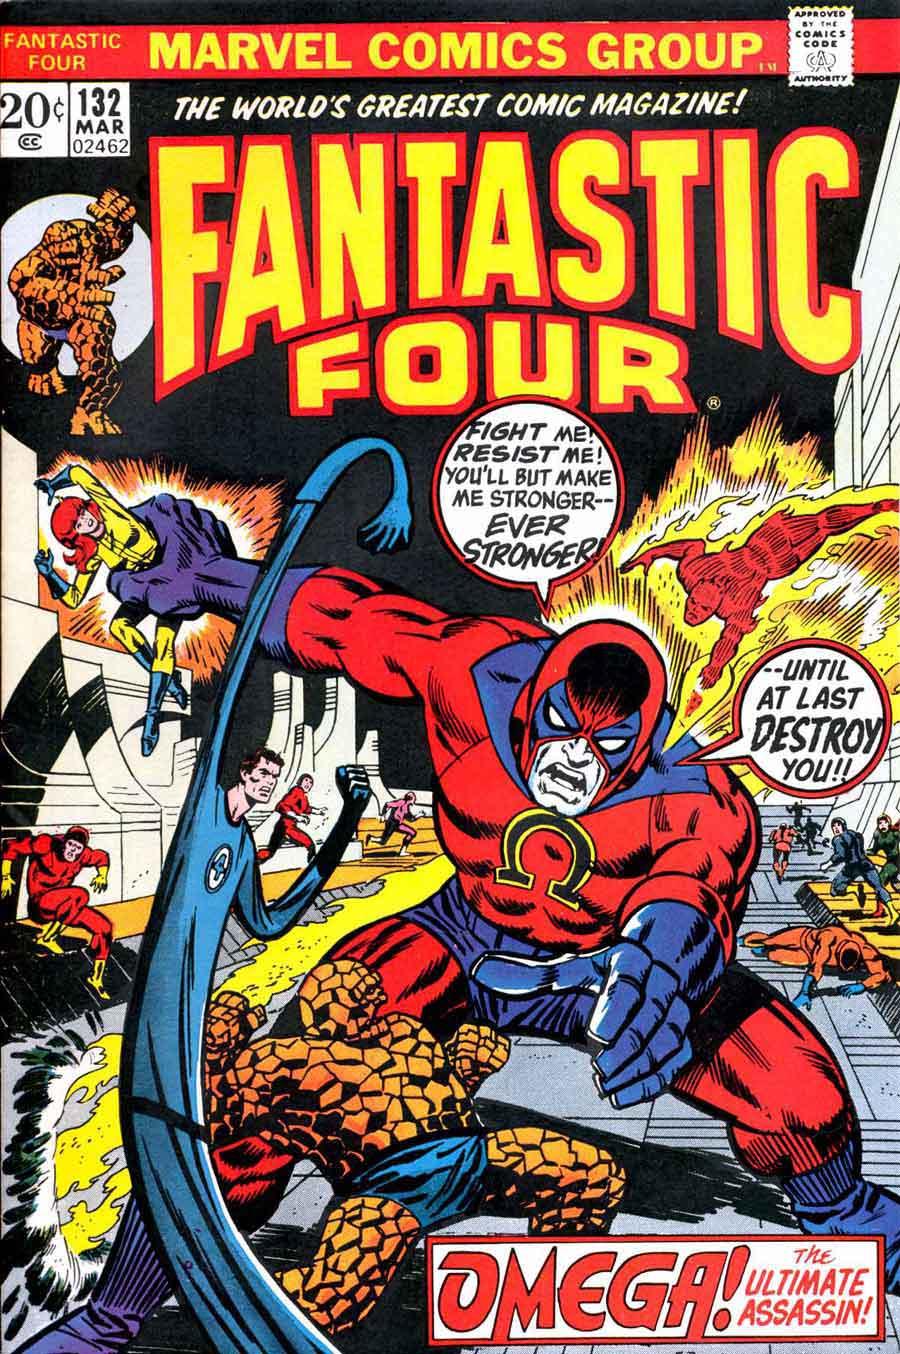 Fantastc Four v1 #132 marvel comic book cover art by Jim Steranko